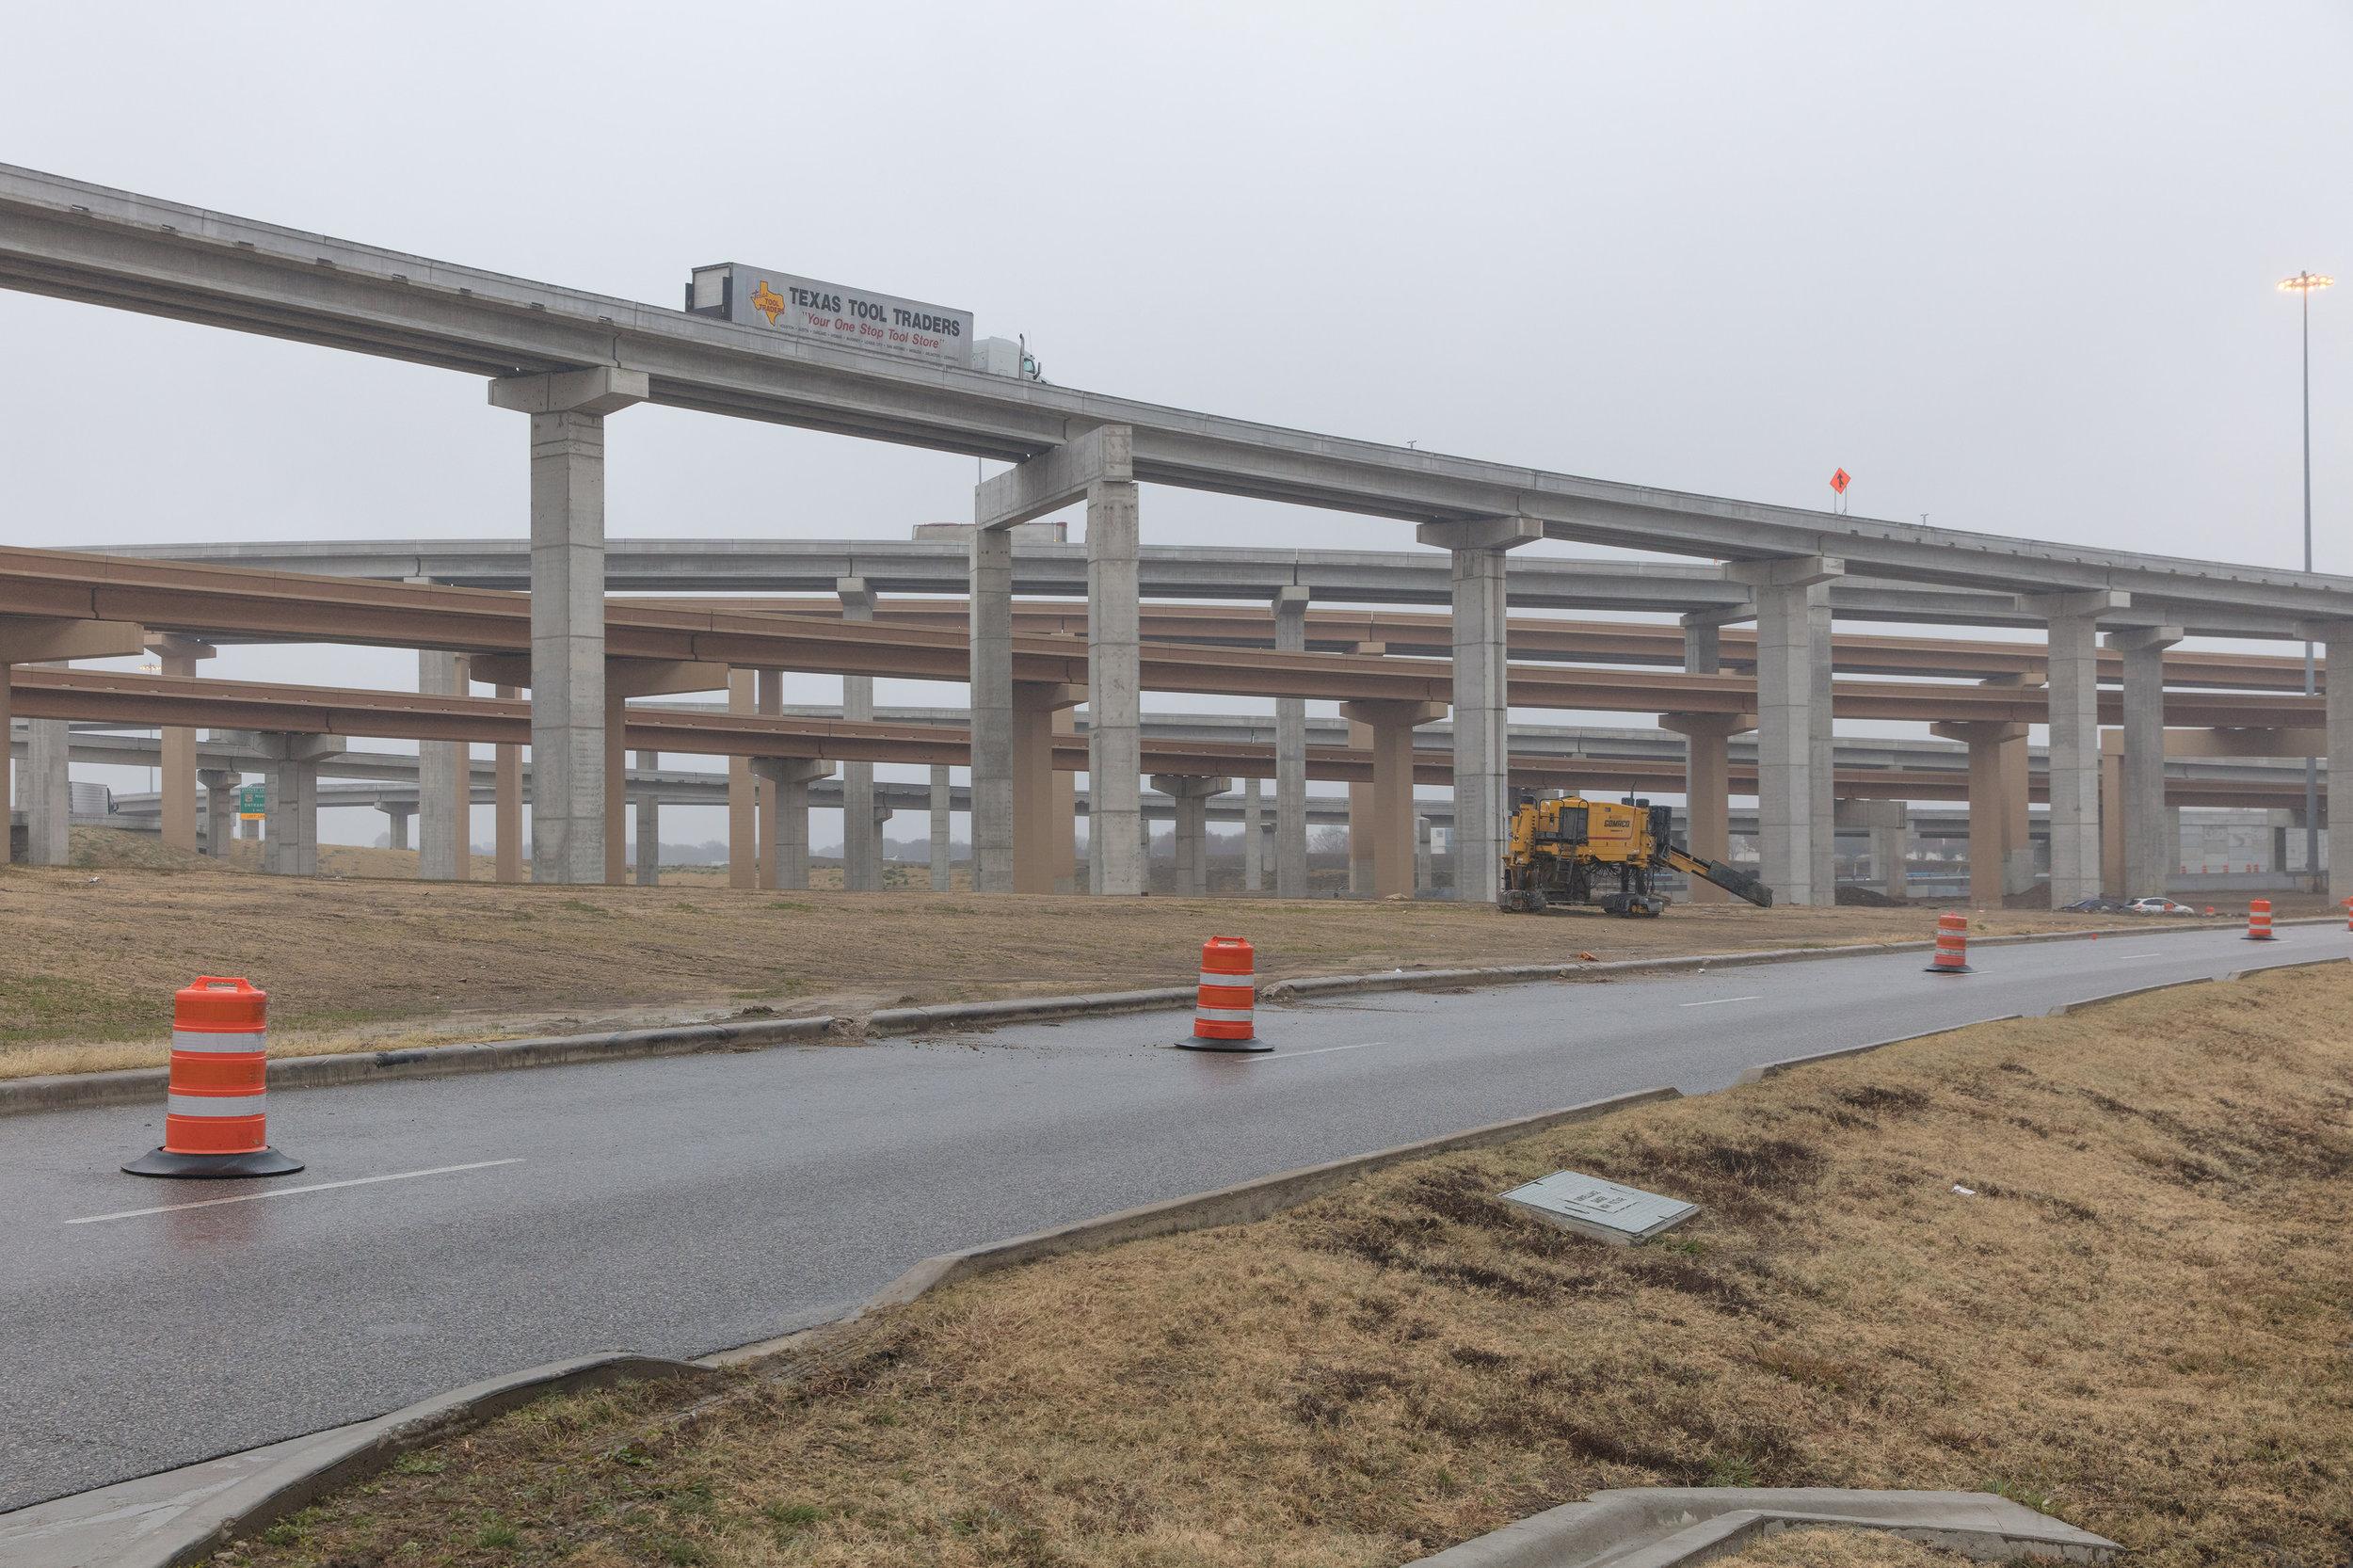 I-820 & I-35 - Fort Worth, Texas (2017)